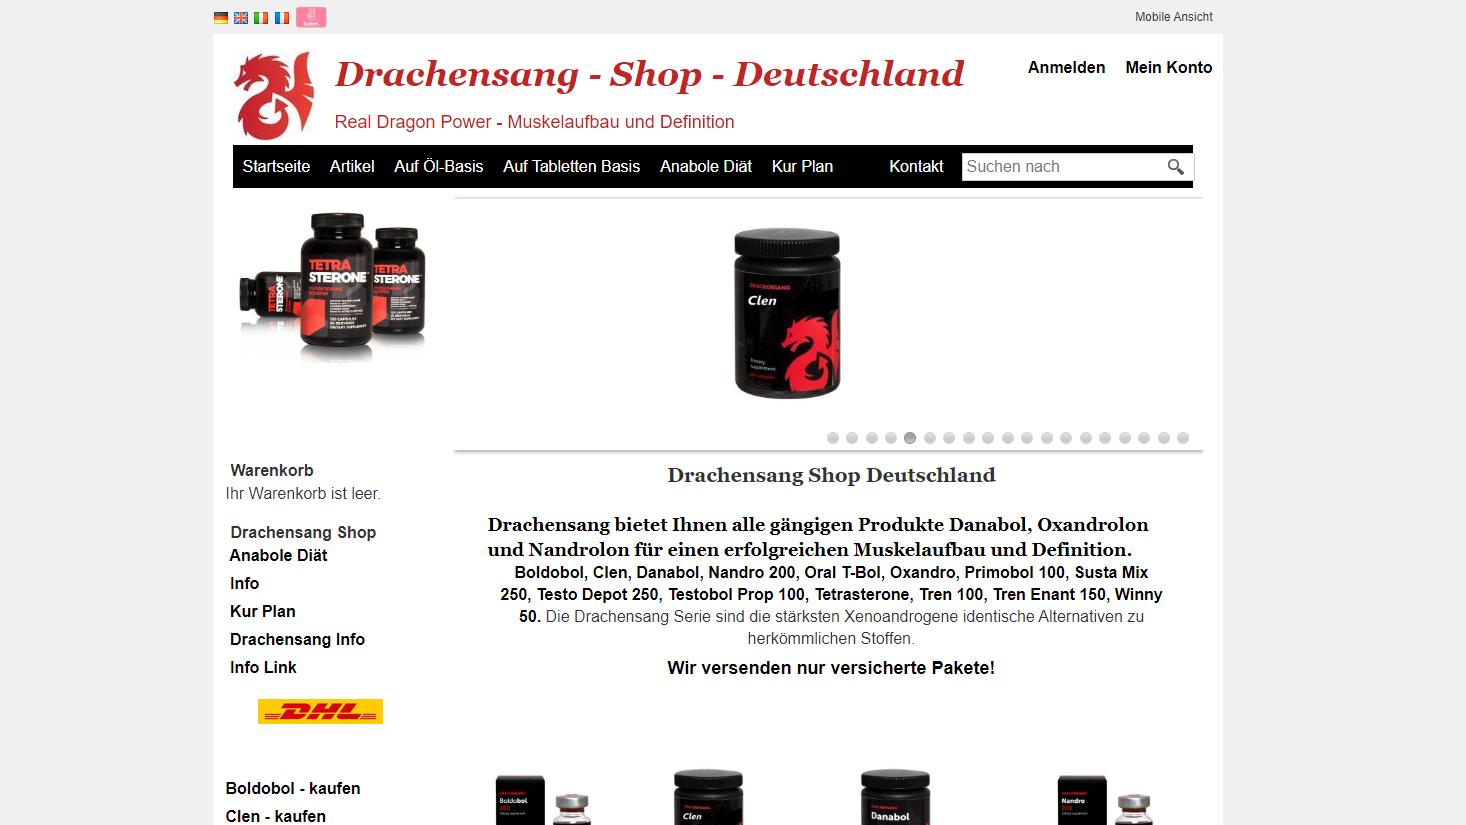 Https Drachensang Shop De In 2020 Cool Things To Buy Raw Dog Food Recipes Chroma Key